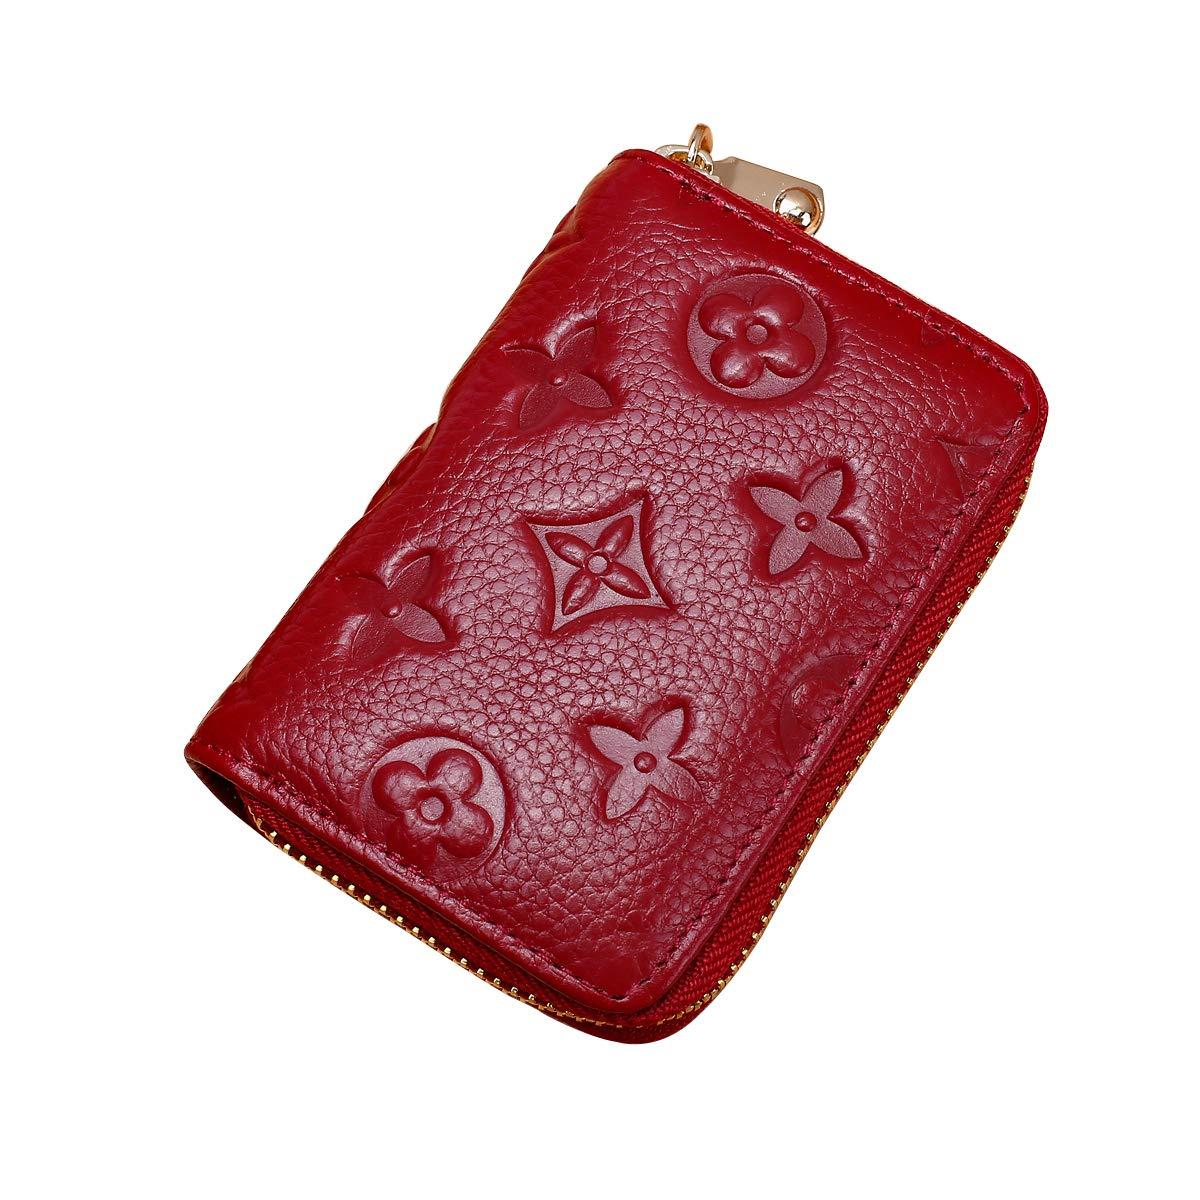 Auner Womens Wallet RFID Blocking Genuine Leather Multi Credit Card Holder Zipper Small Wallets - Dark Red